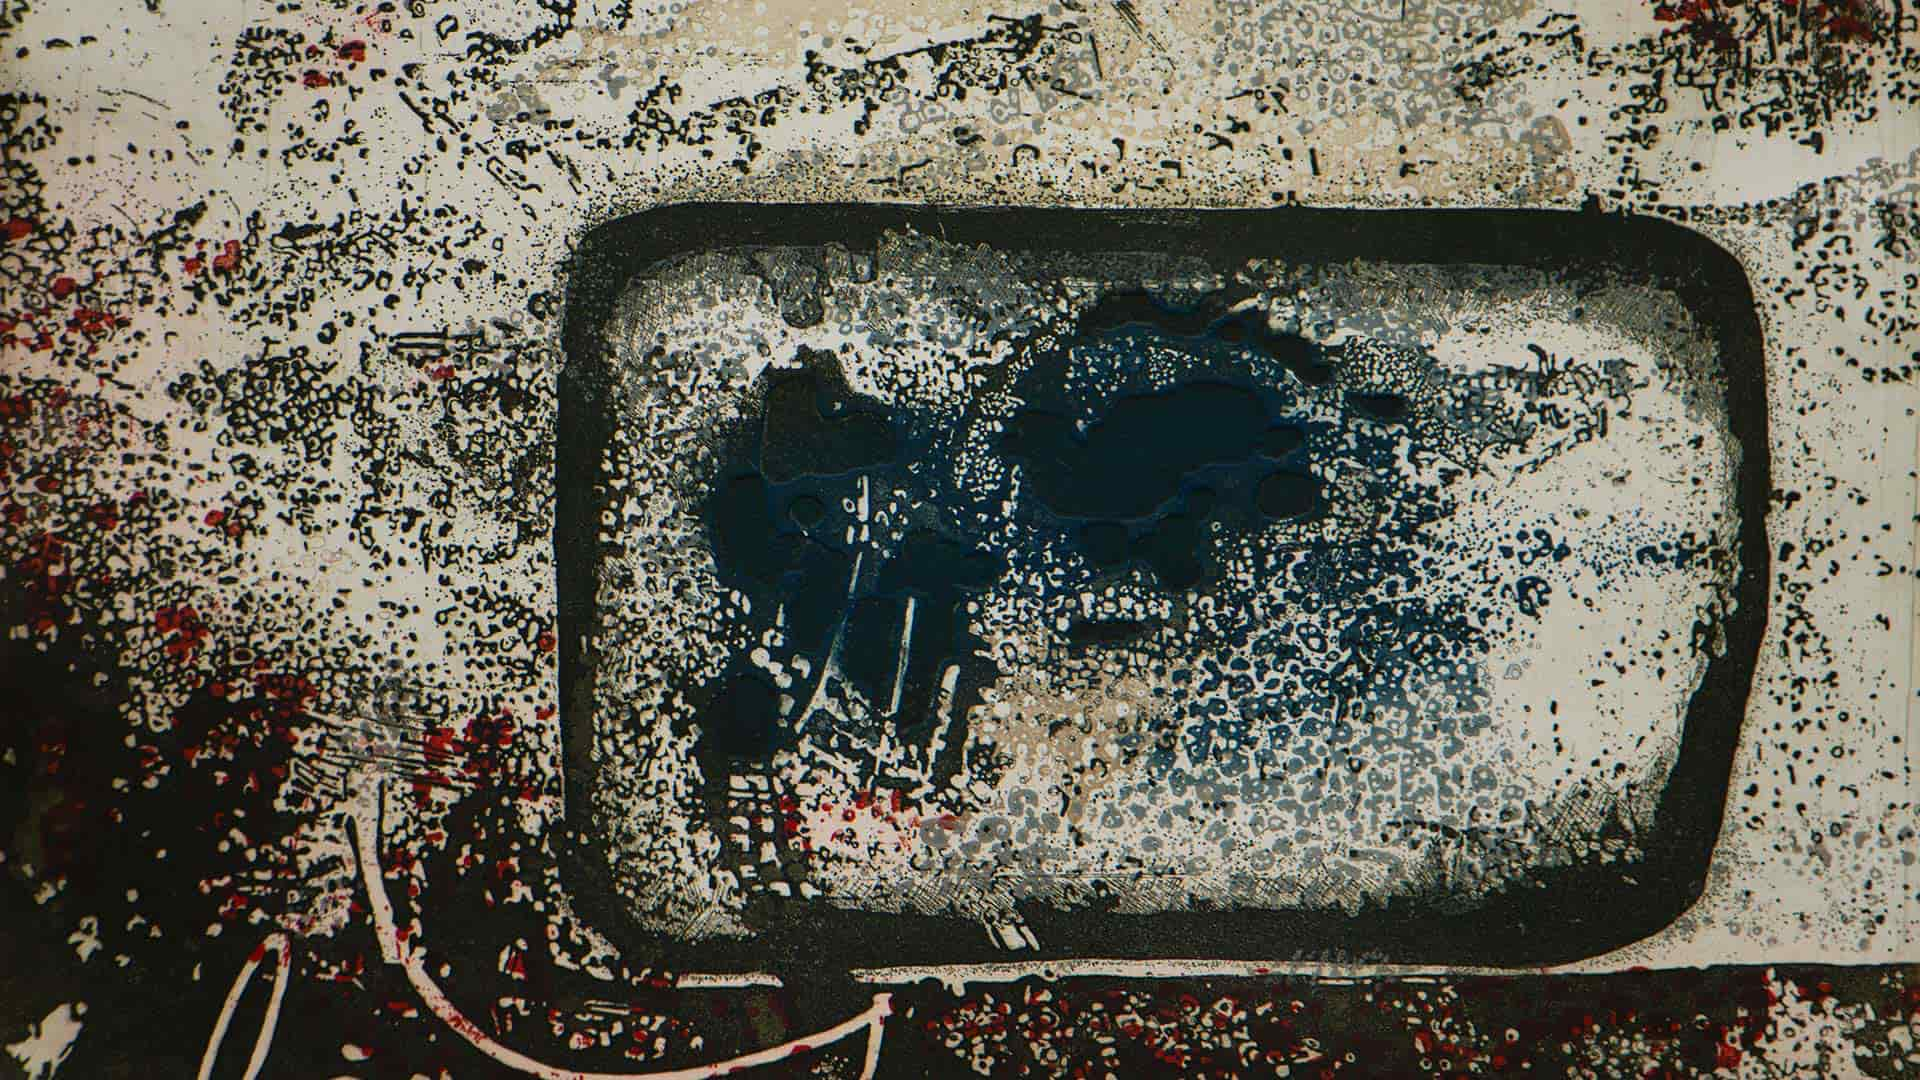 Spectre etching carborundum fine art print by Stephen Vaughan detail